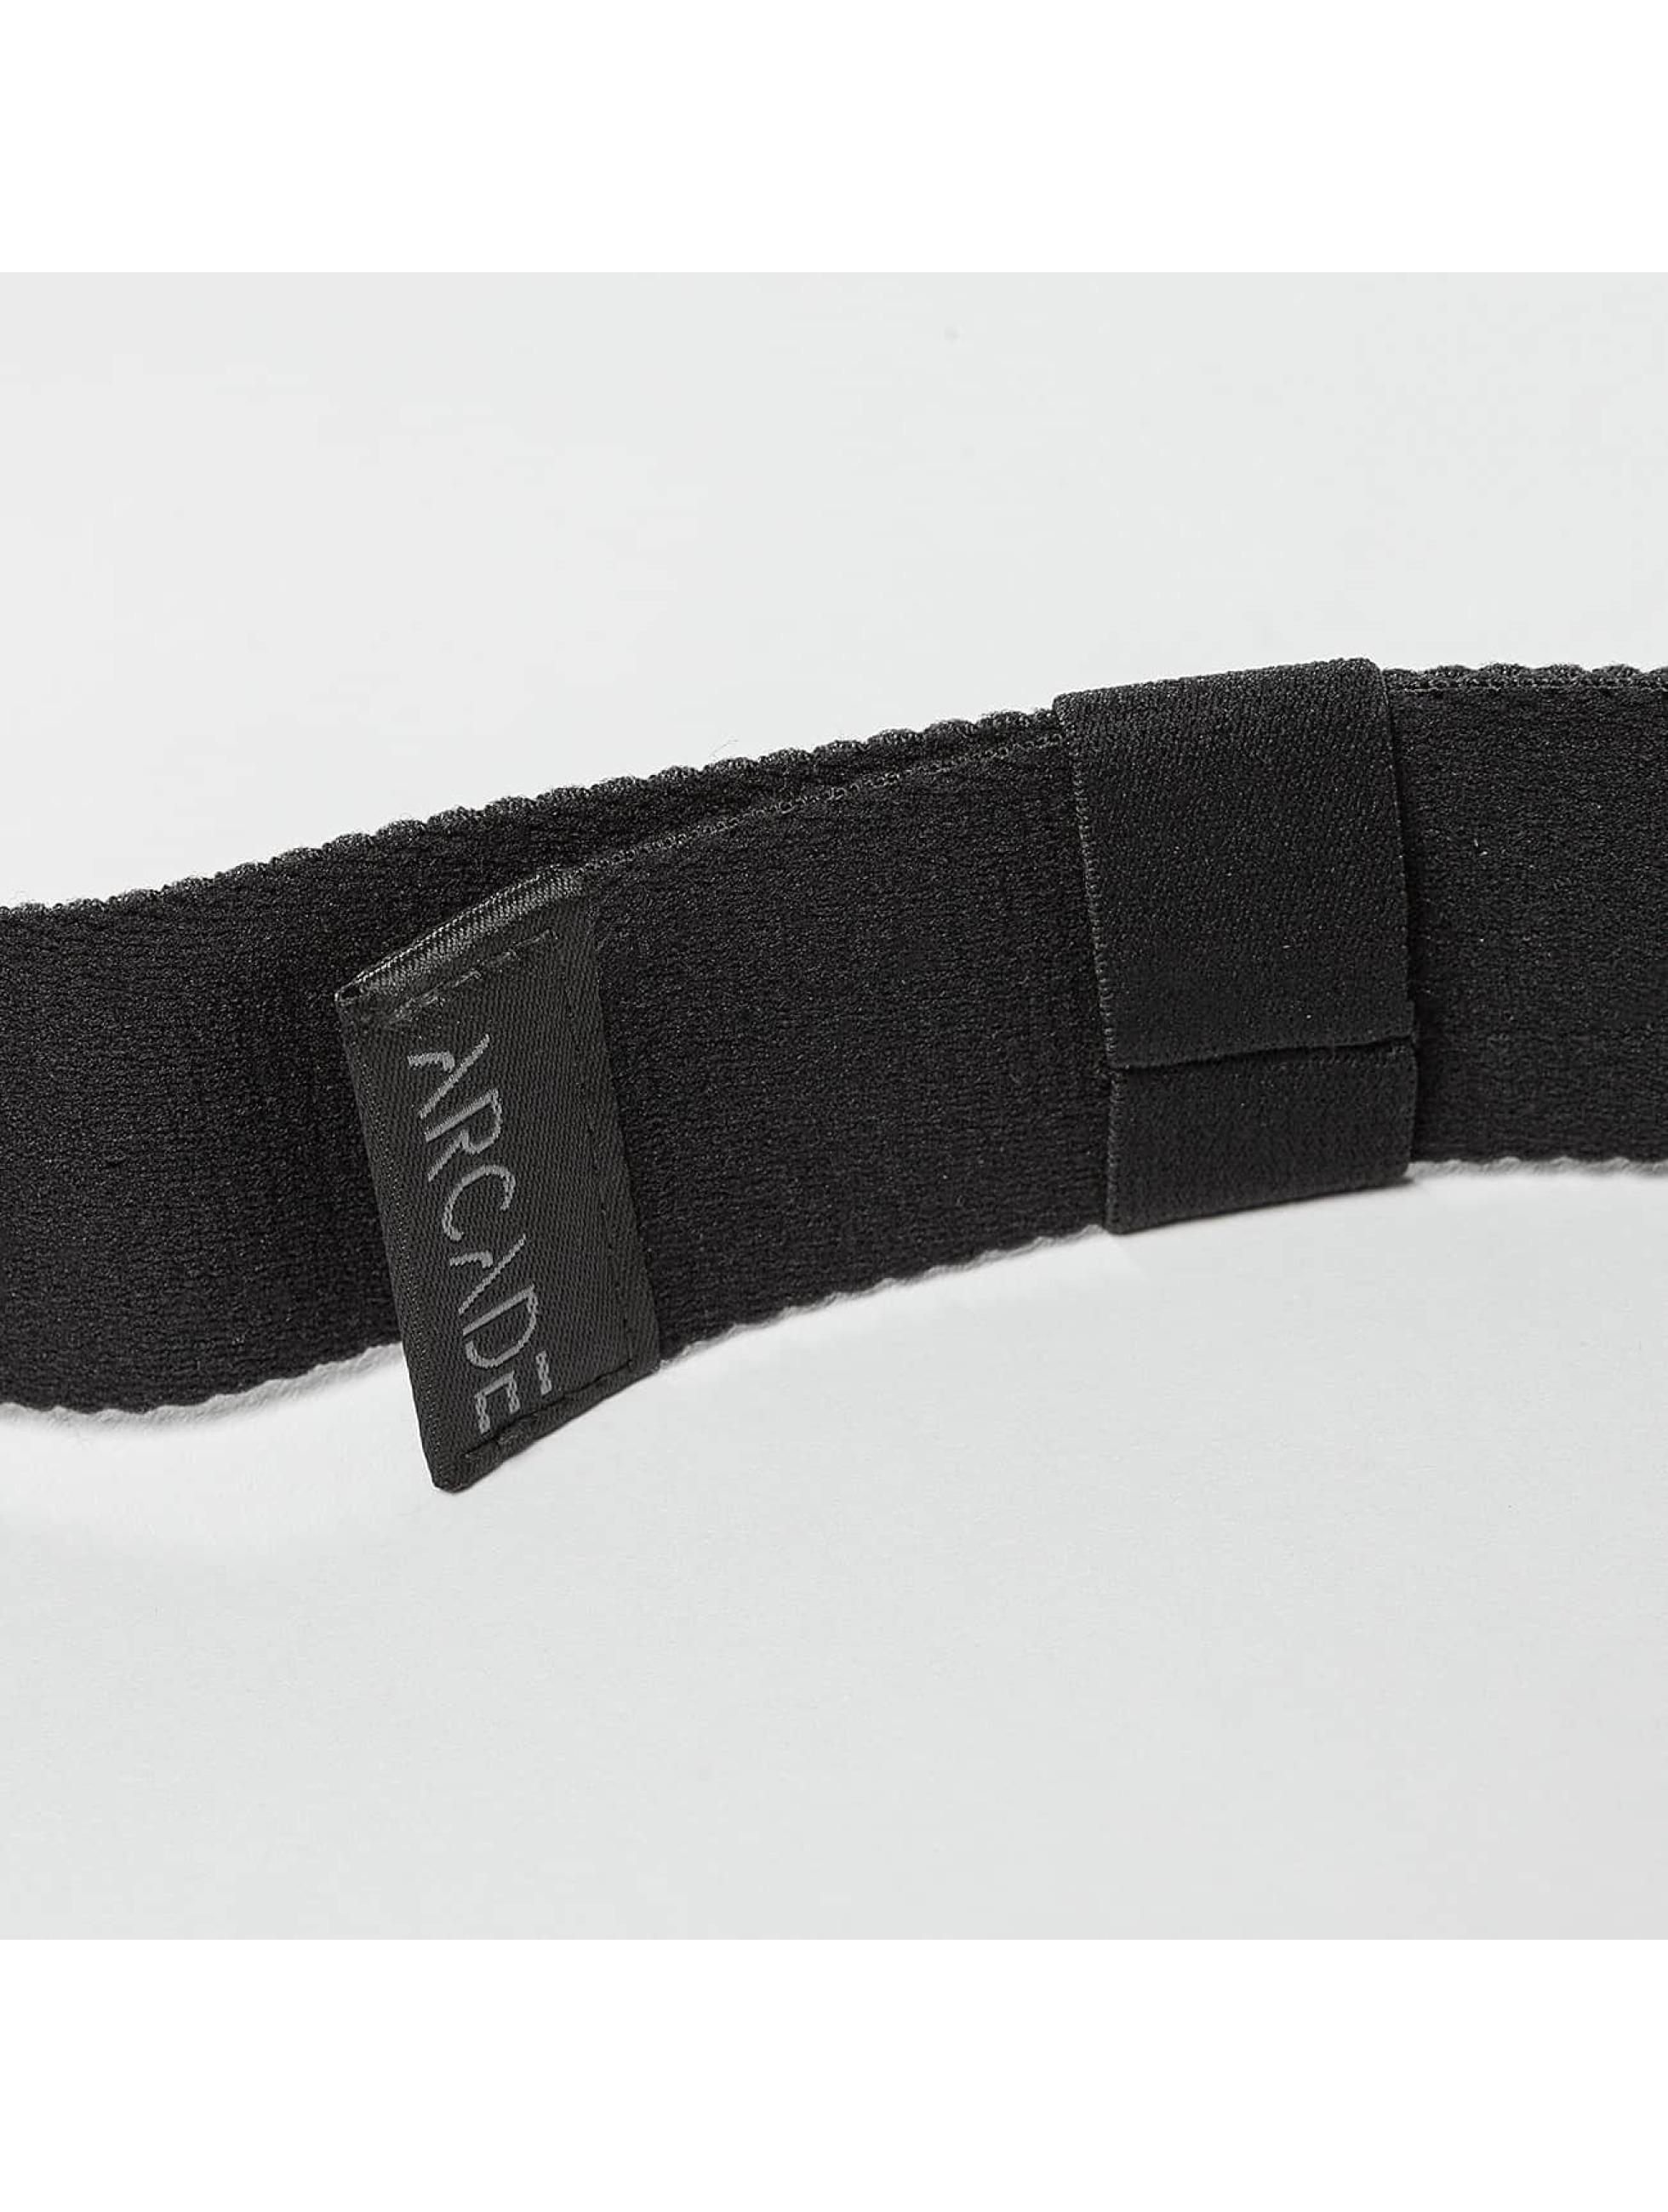 ARCADE riem The N Belt zwart